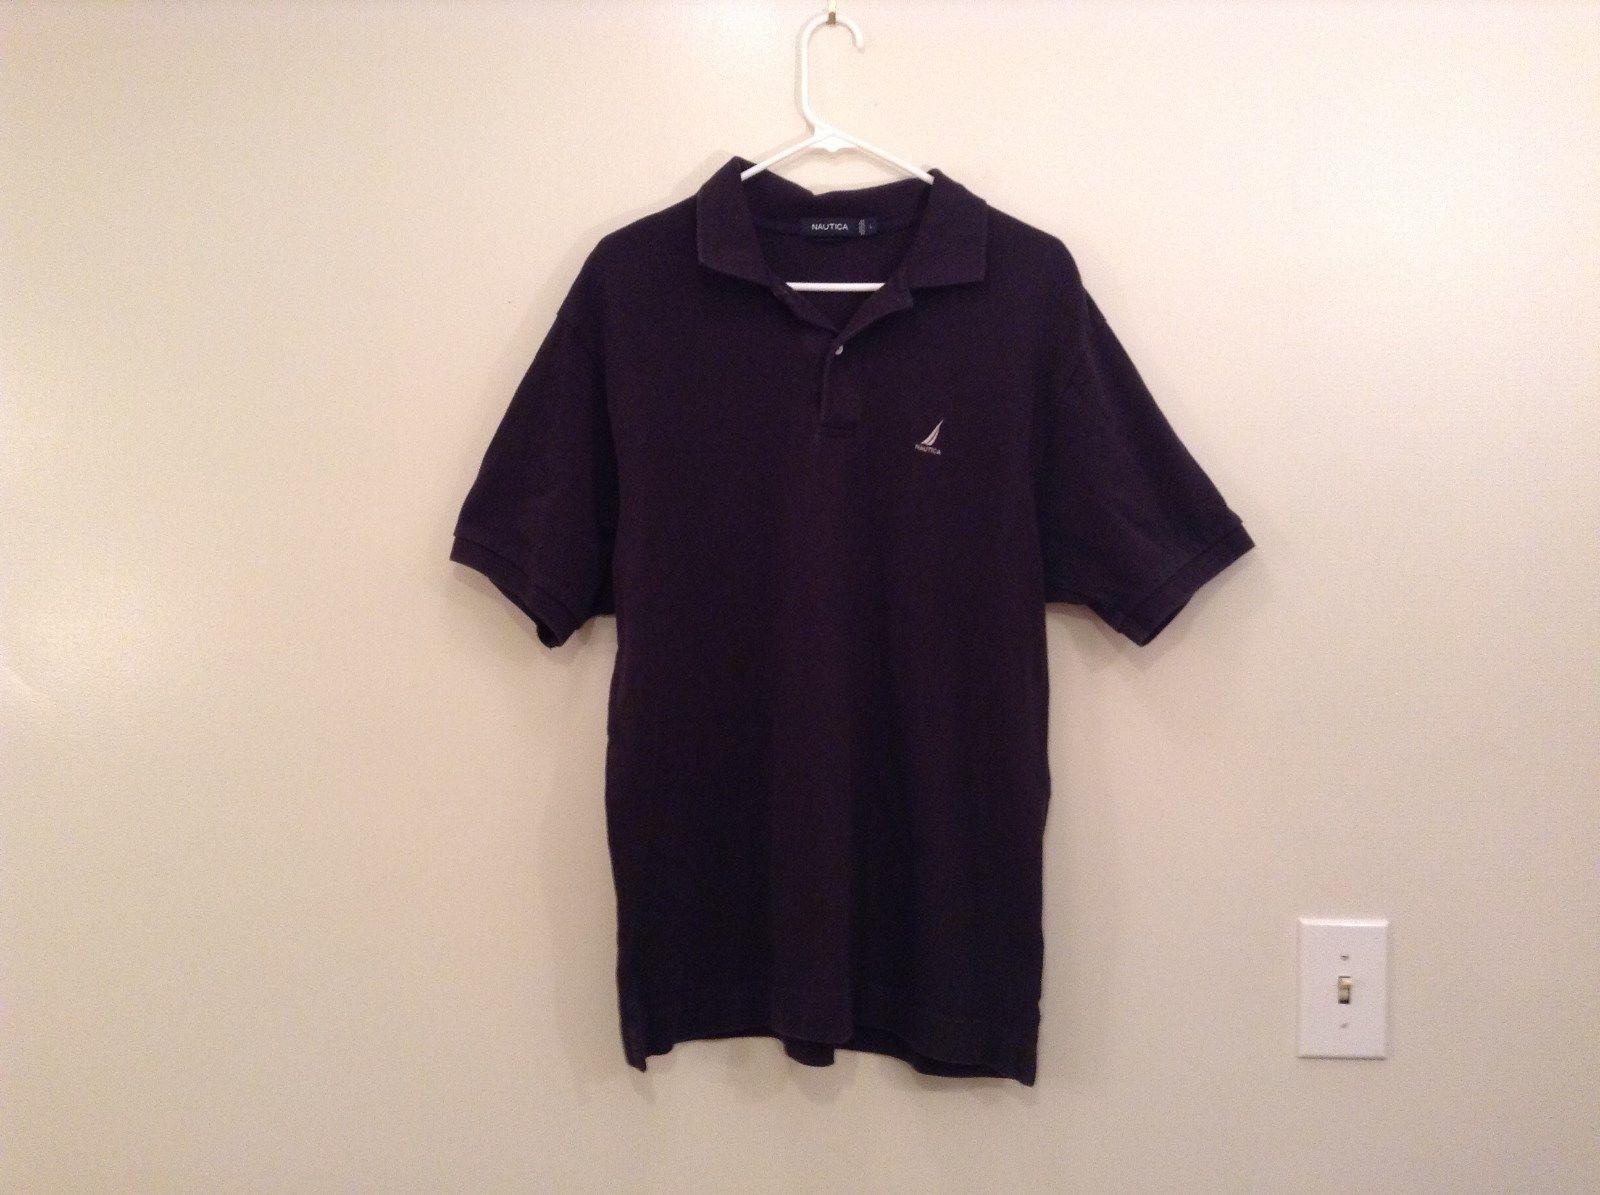 Black Nautica 100 Percent Cotton Short Sleeve Polo Shirt Size Large